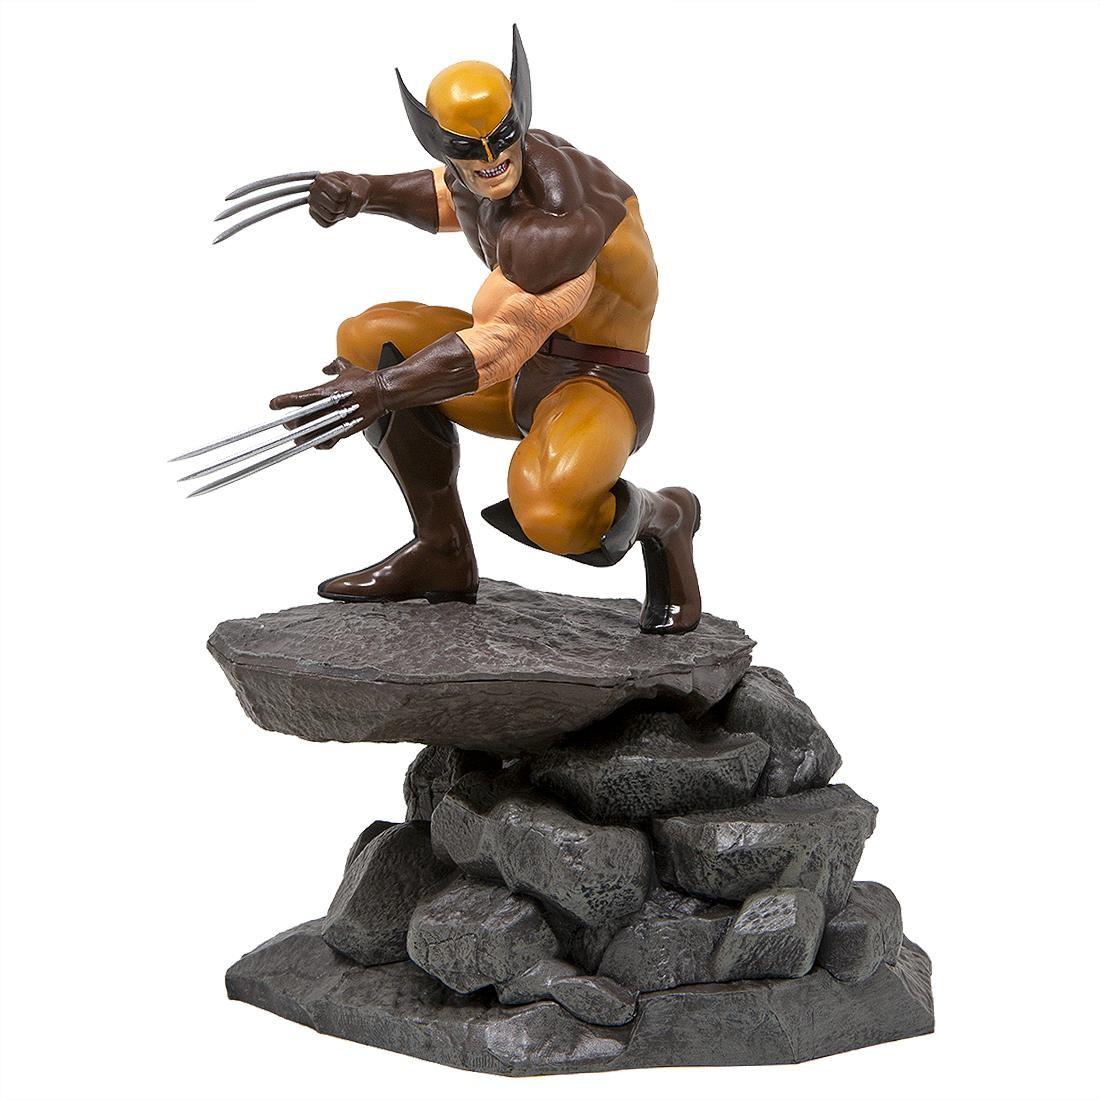 Diamond Select Toys Marvel Gallery X-Men Wolverine Comic PVC Statue (yellow)